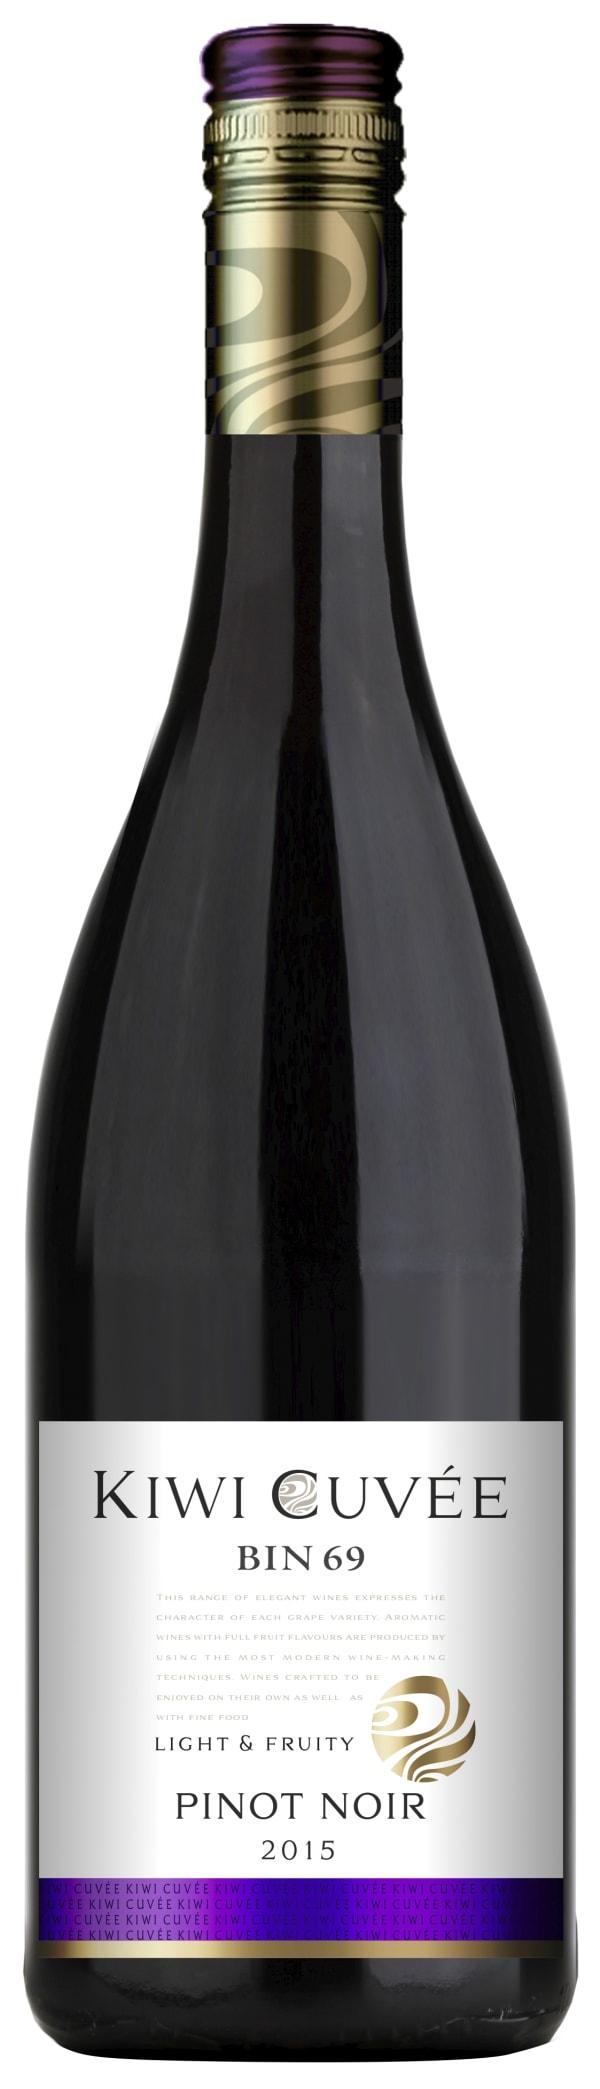 Kiwi Cuvée Bin 69 Pinot Noir 2016